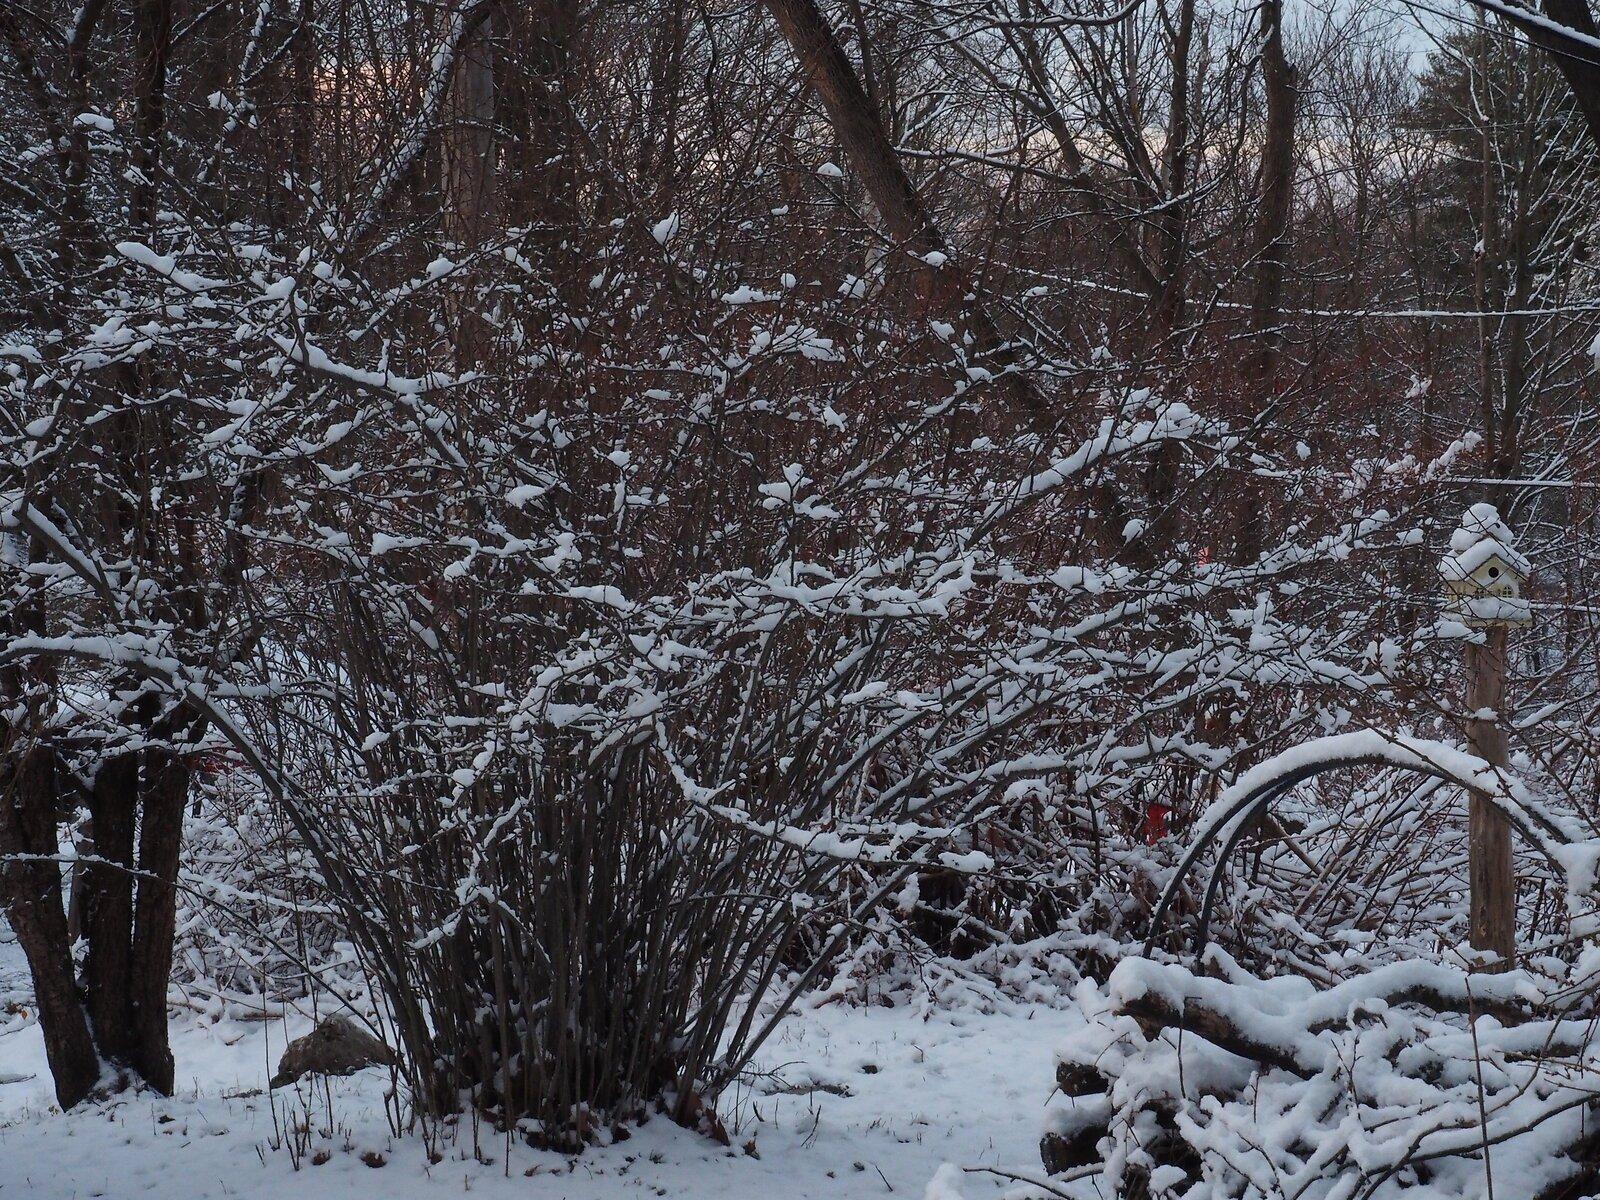 M1 Dec 26 snow 006.JPG